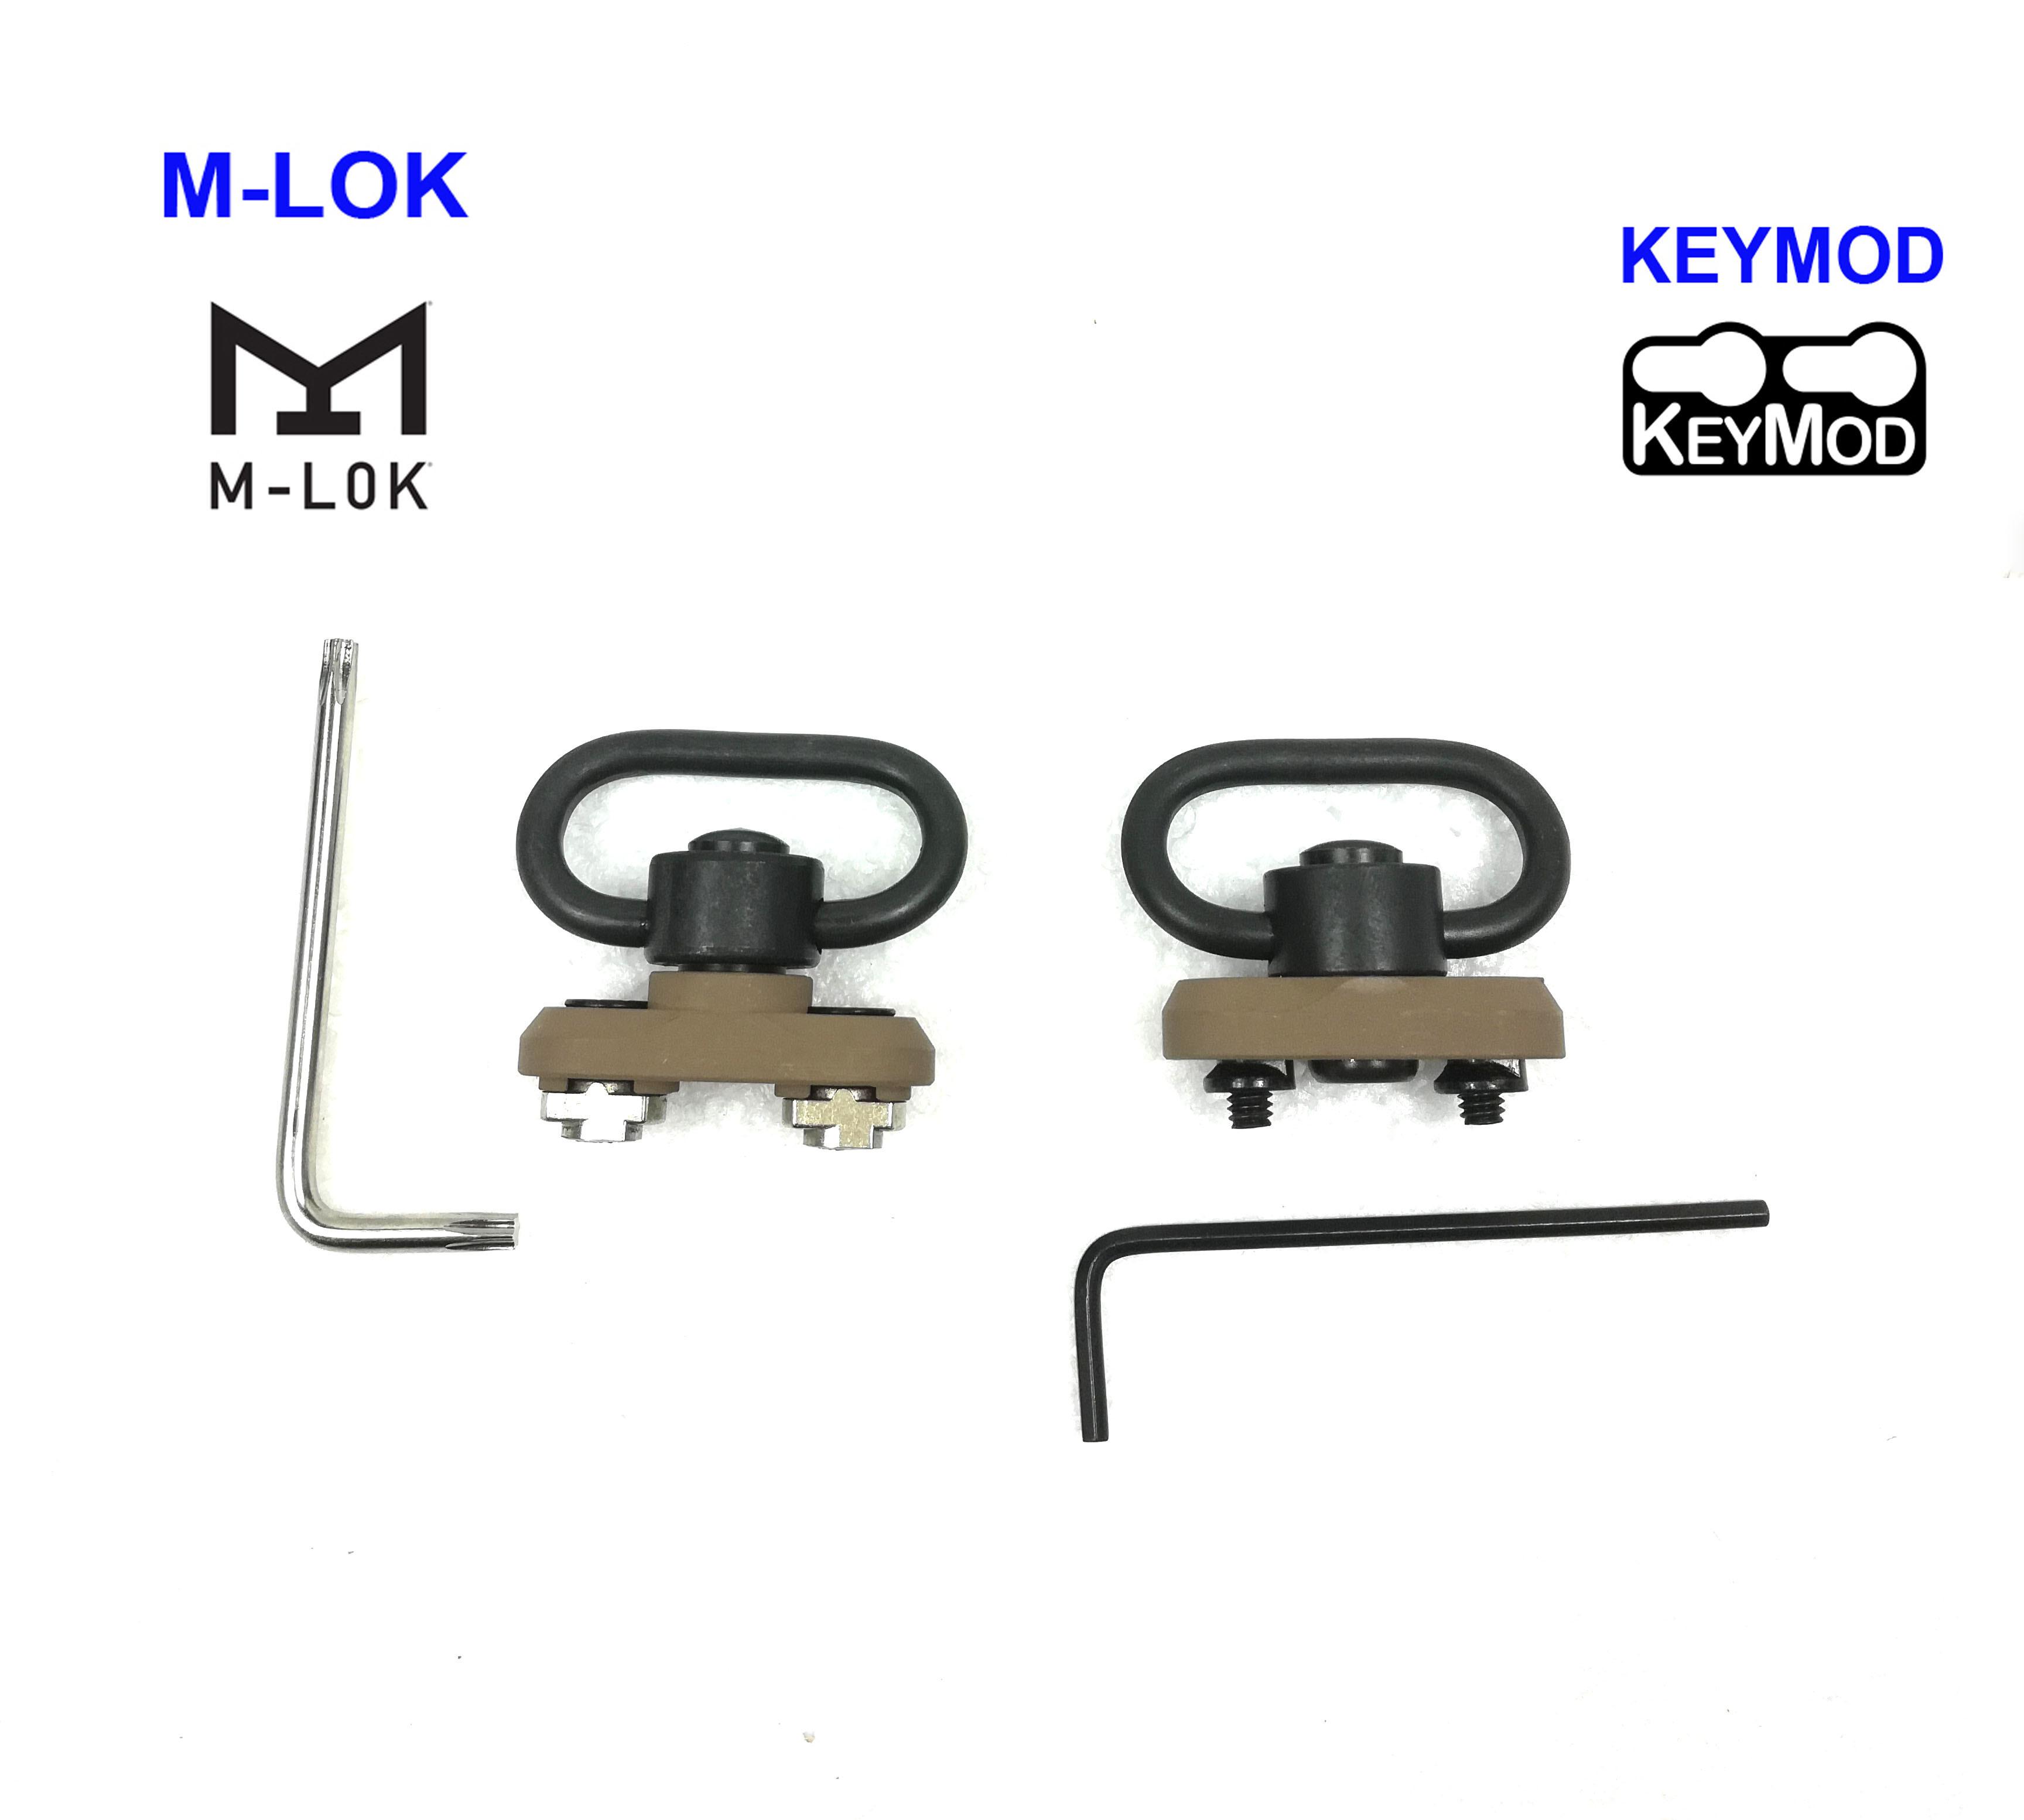 QD Sling Swivel Keymod Adapter Rail Mount Kit Tan color Sling Adapter